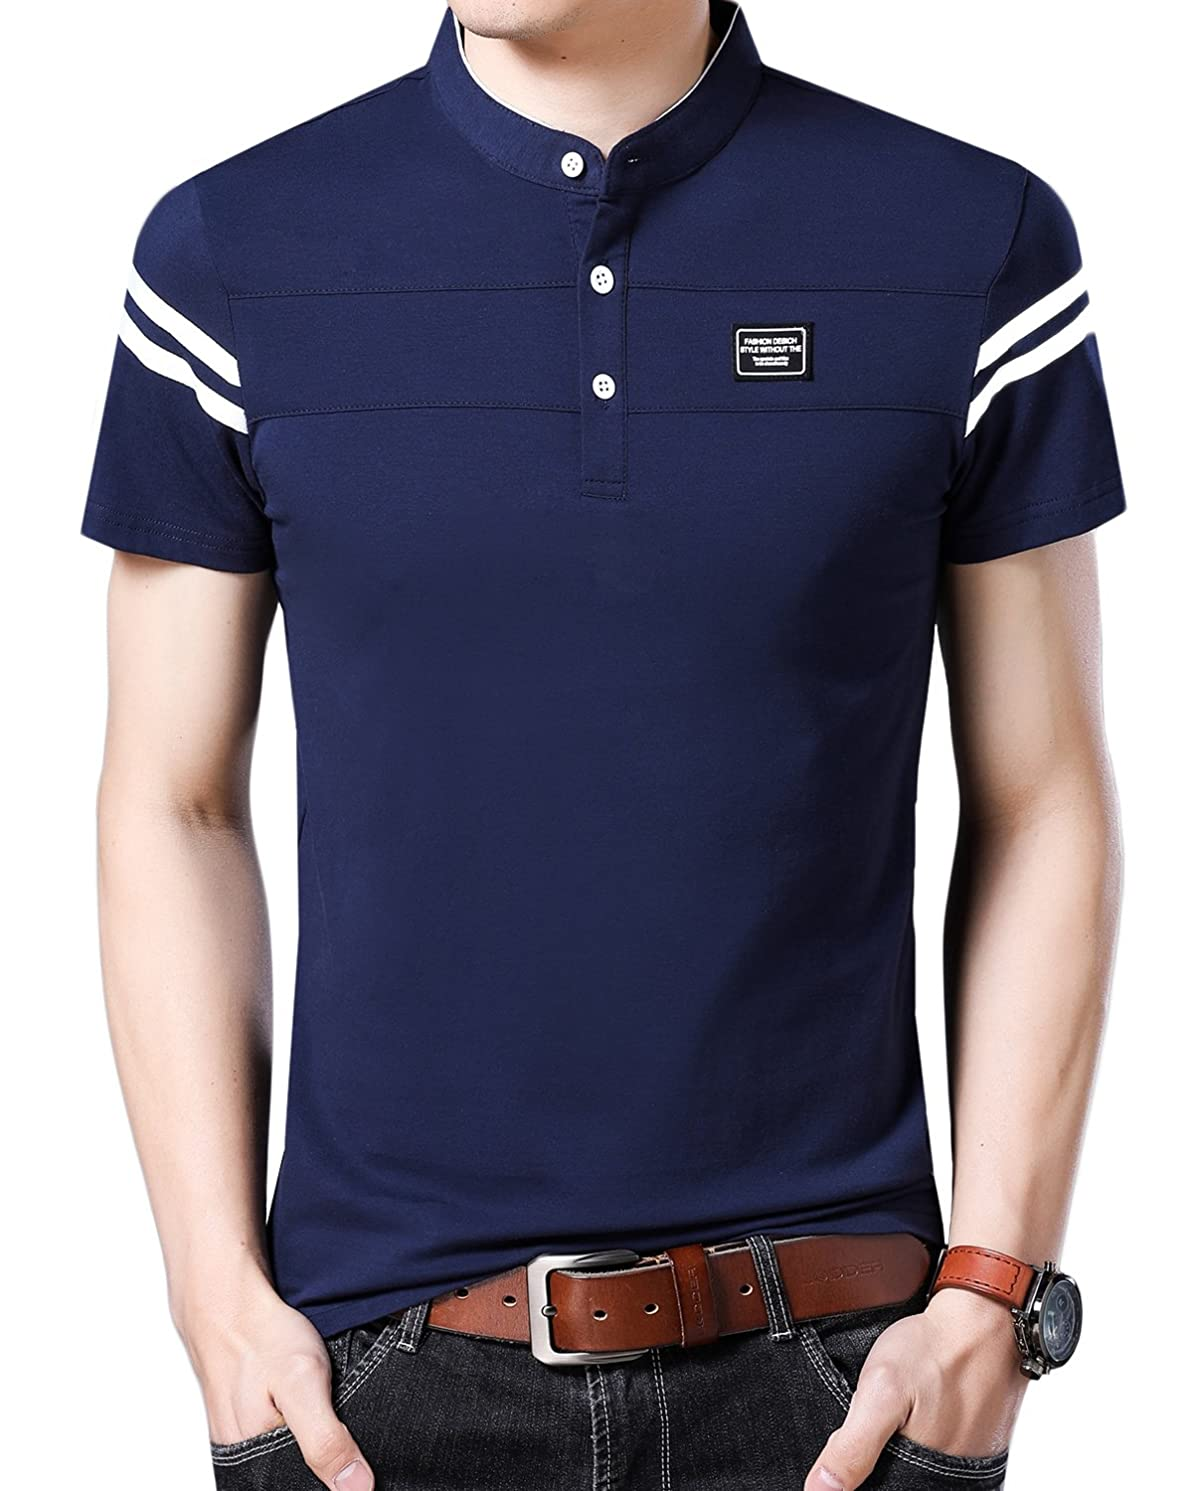 YinQ Mens Casual Slim Fit Golf Polo Shirt Short-Sleeve Polo Golf Shirts Tops